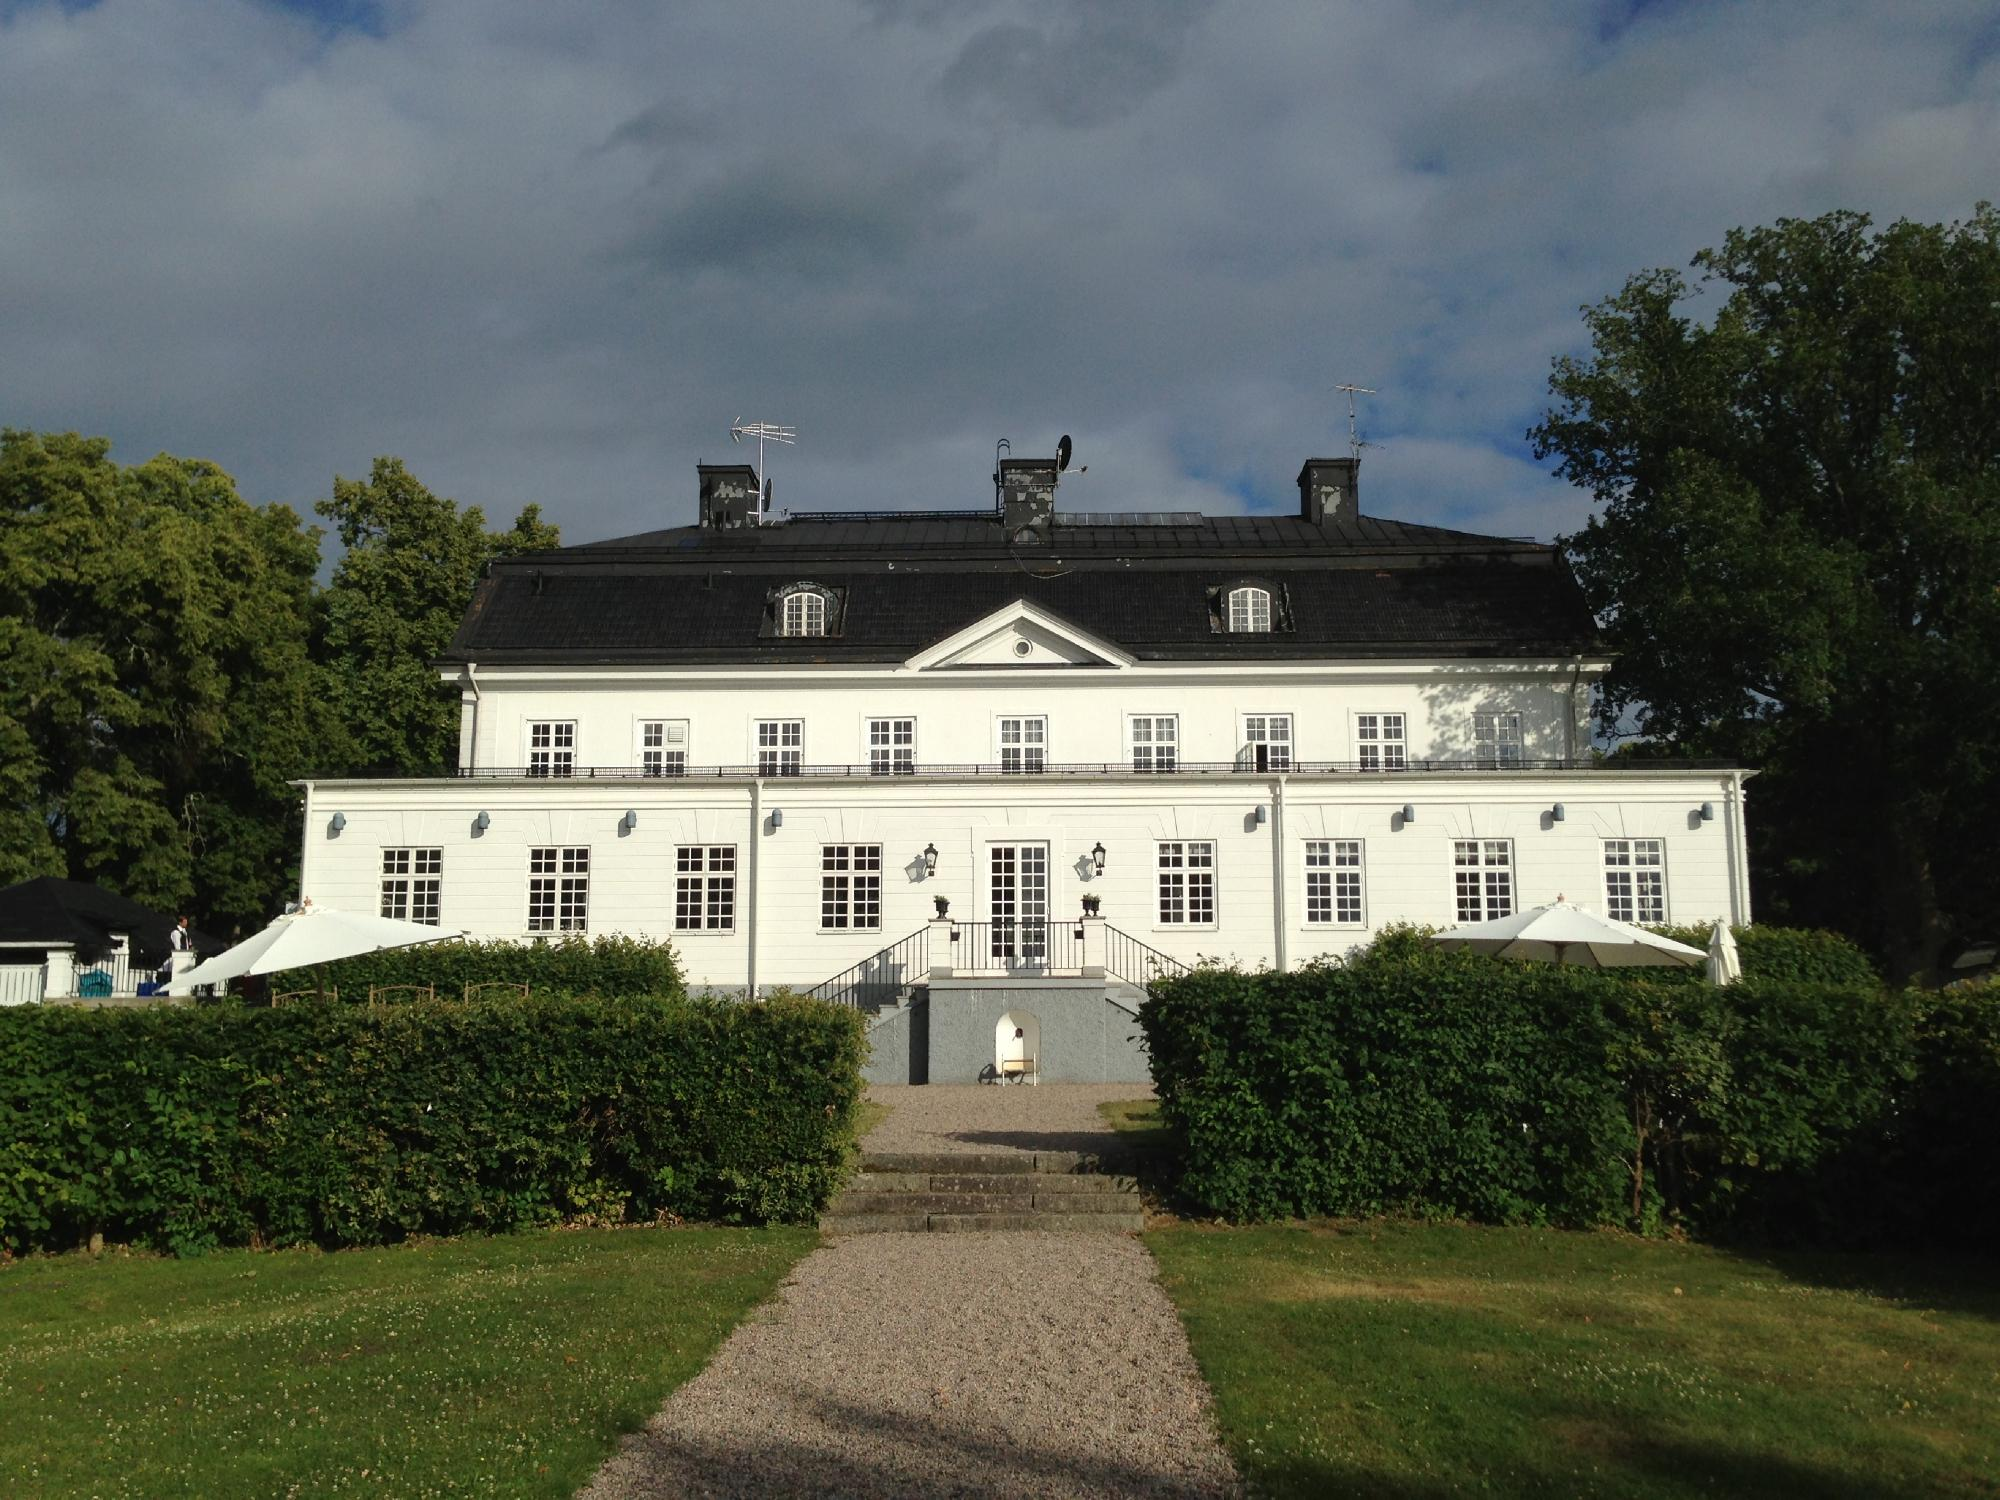 Yxtaholm Slott